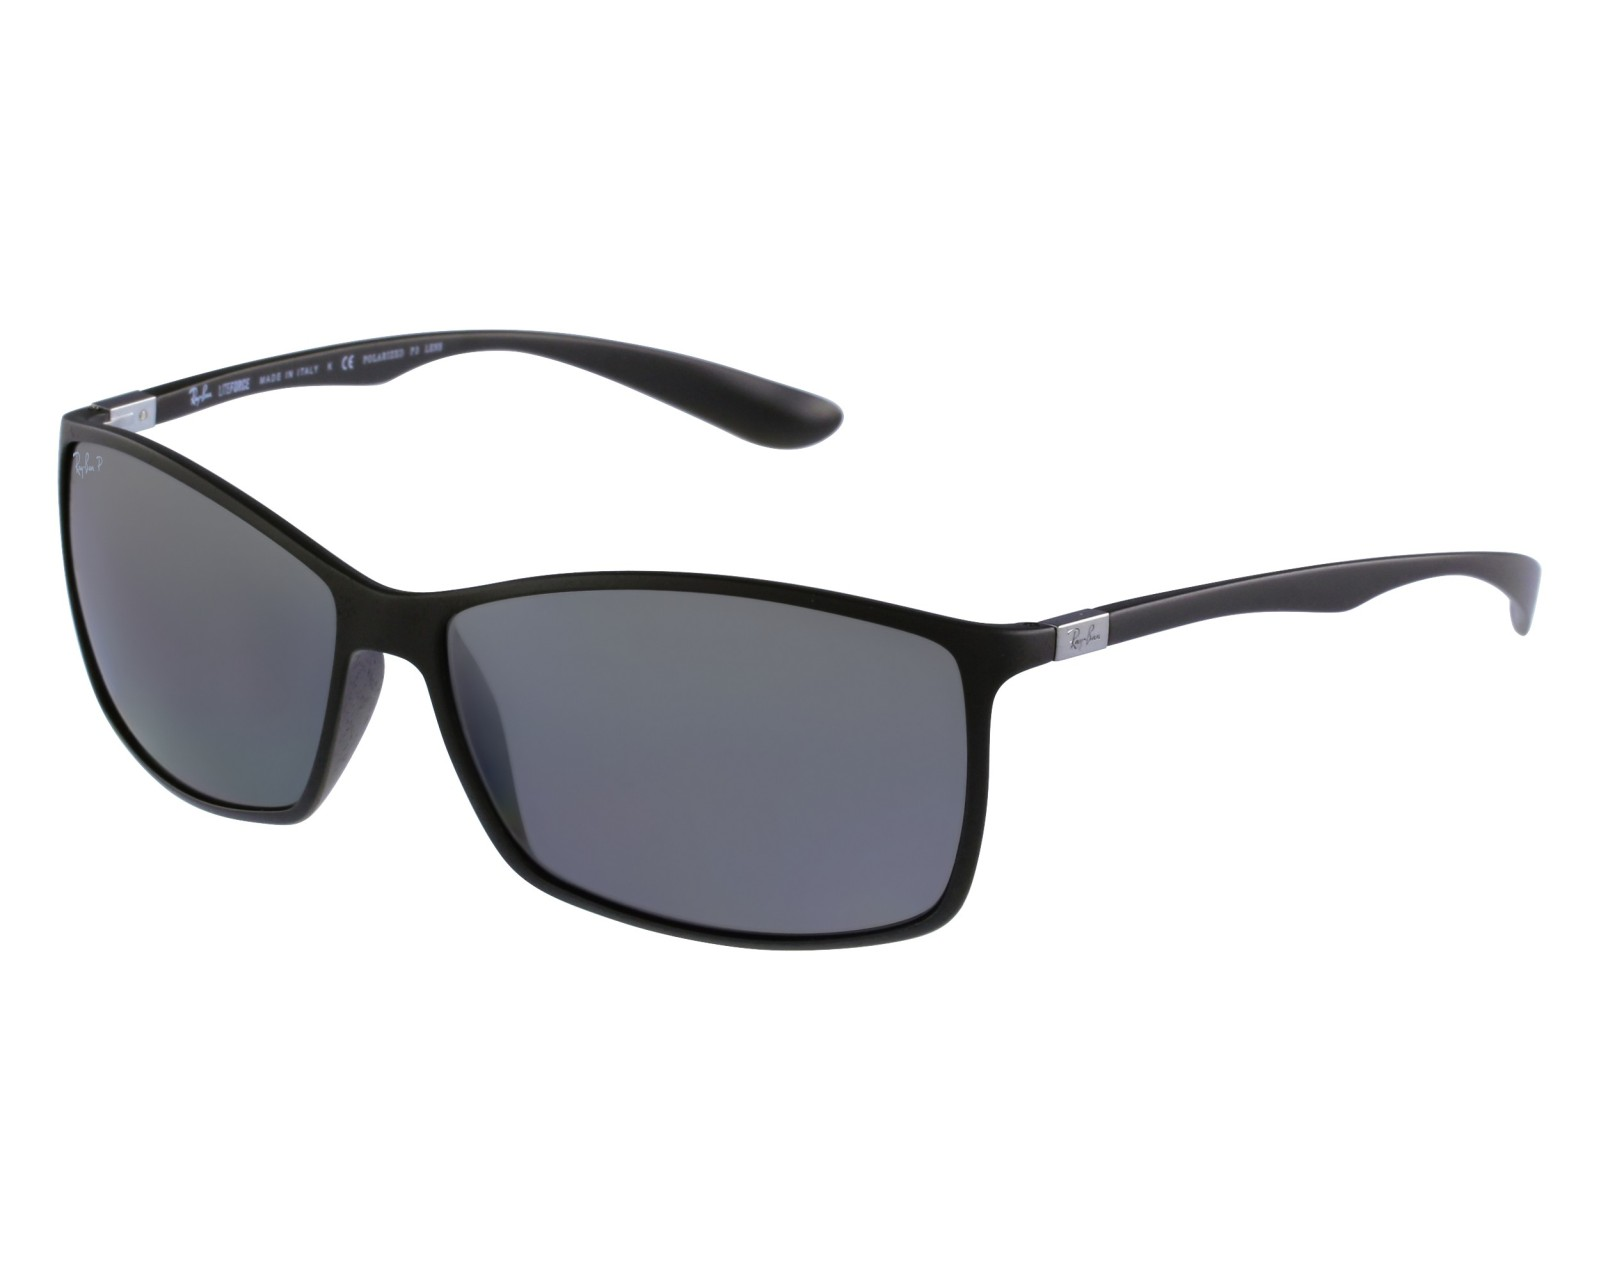 fe763cd859f Sunglasses Ray-Ban RB-4179 601-S 82 62-15 Black